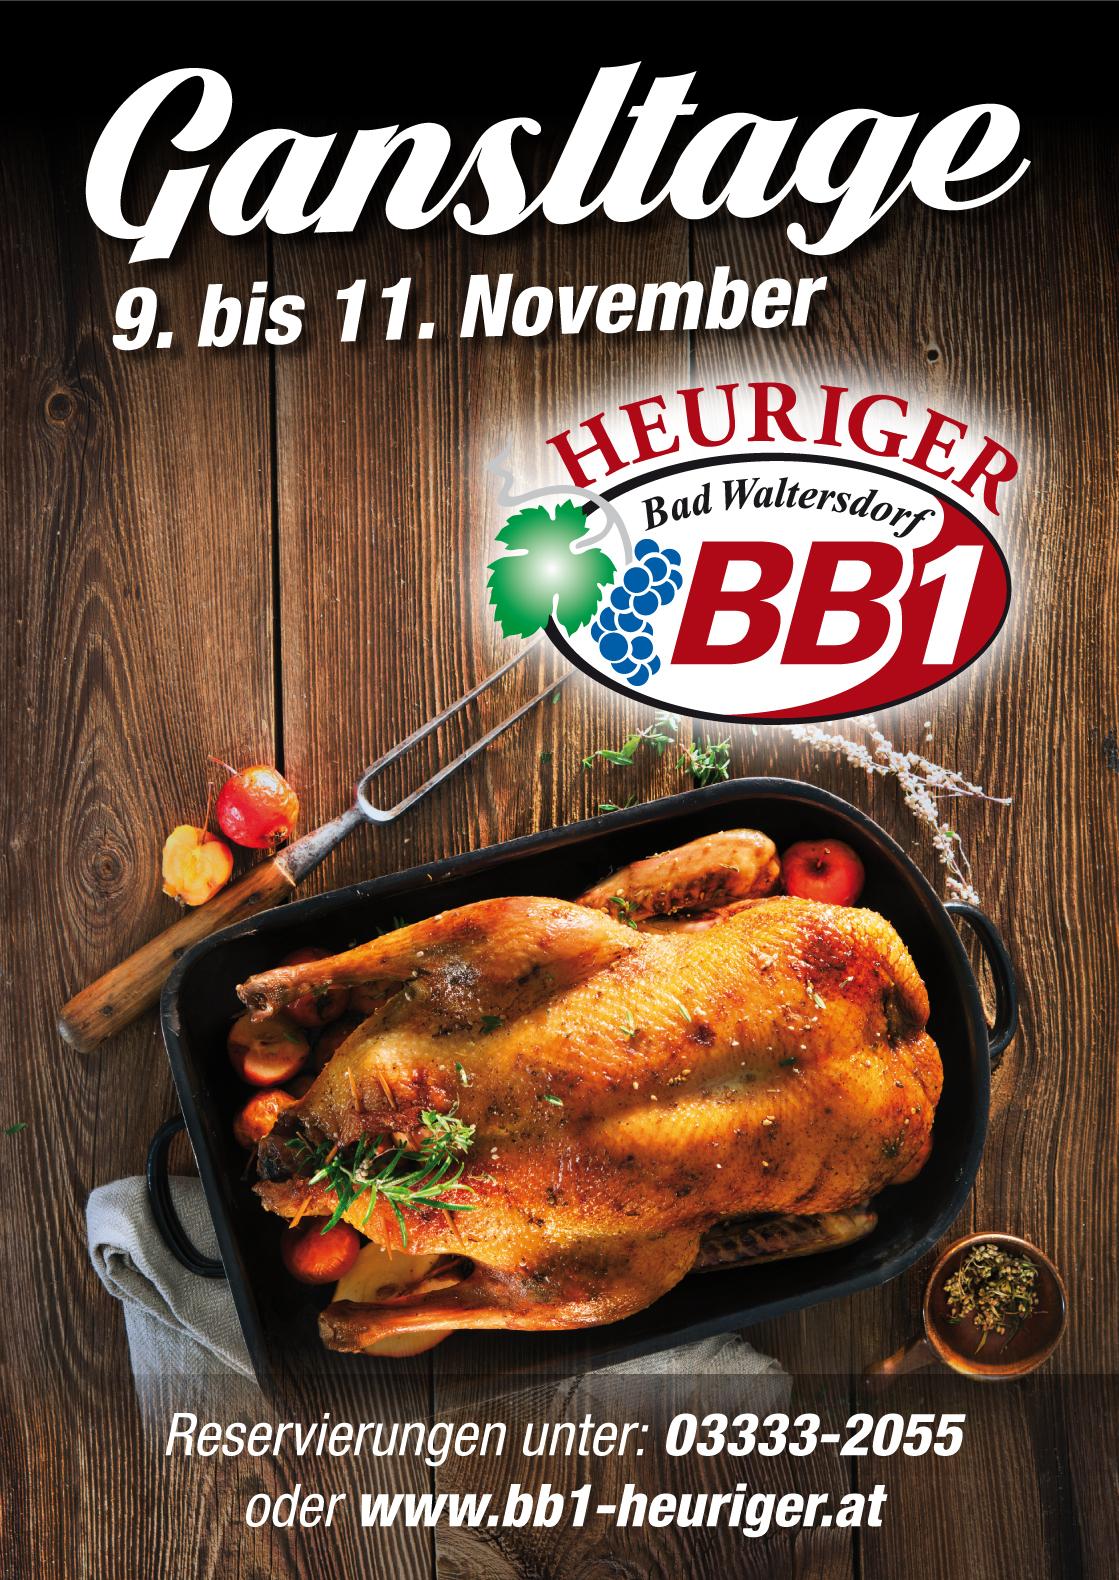 BB1 PLAKAT A4-A2 Ganseltage